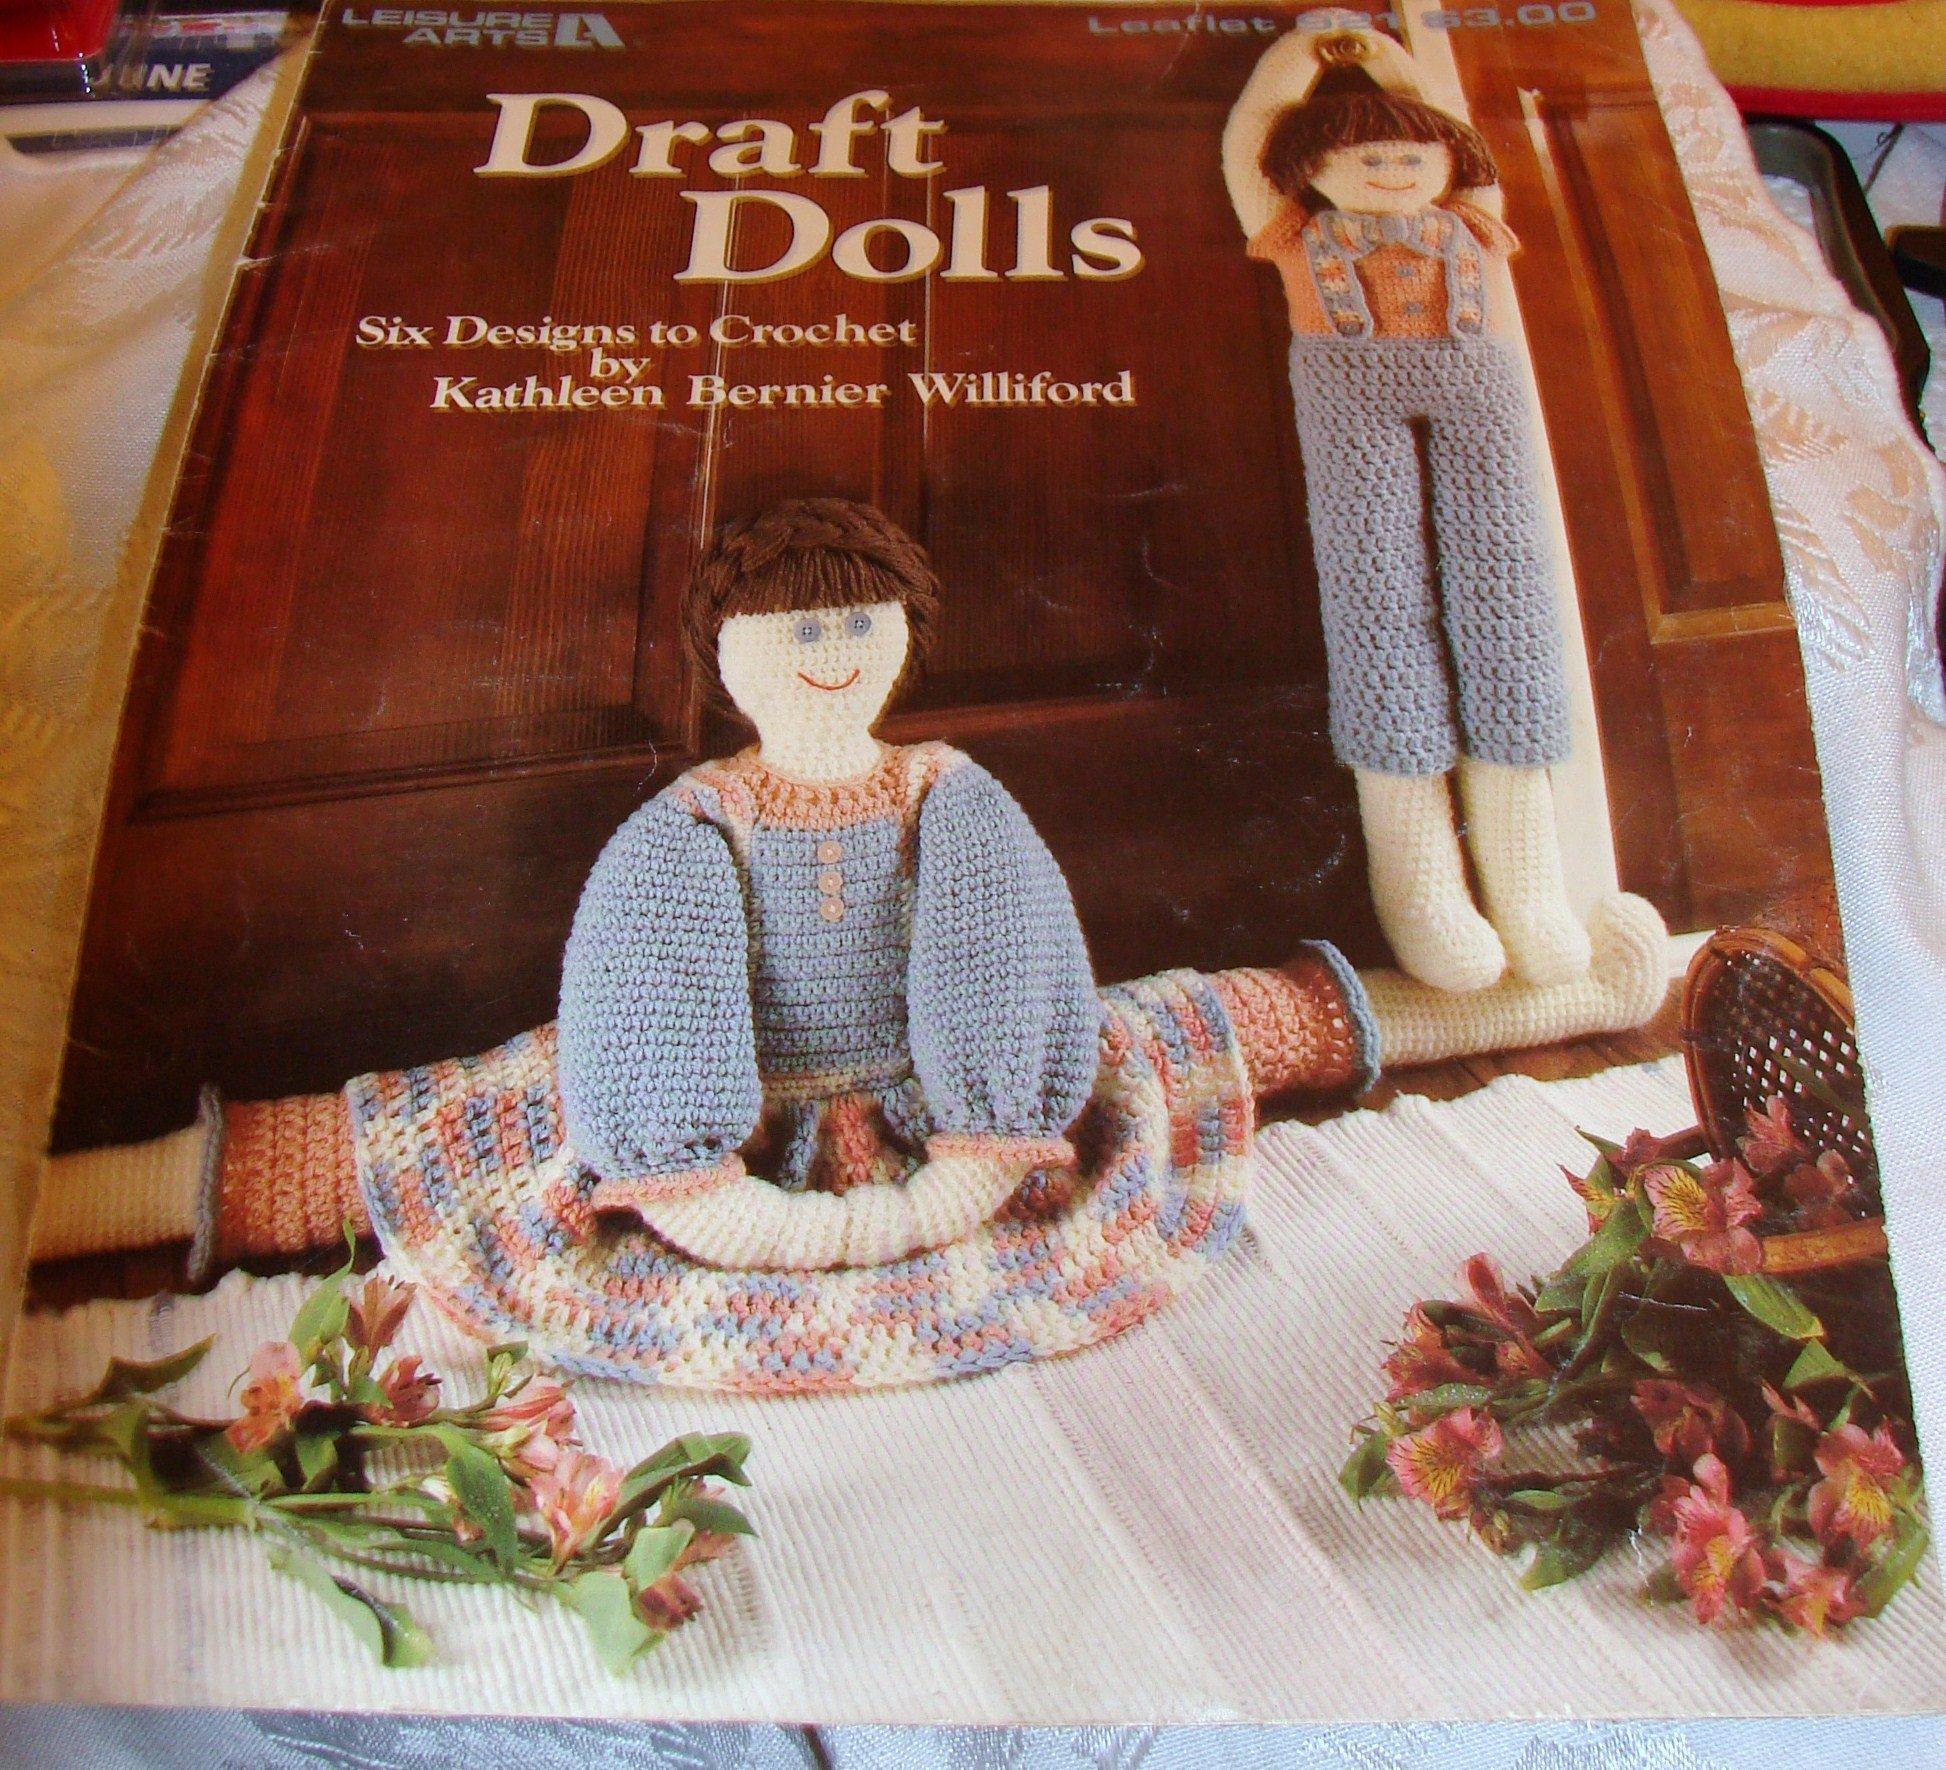 Draft Dolls - Crochet Pattern Pamphlet - #921 - Leisure Arts - 1990